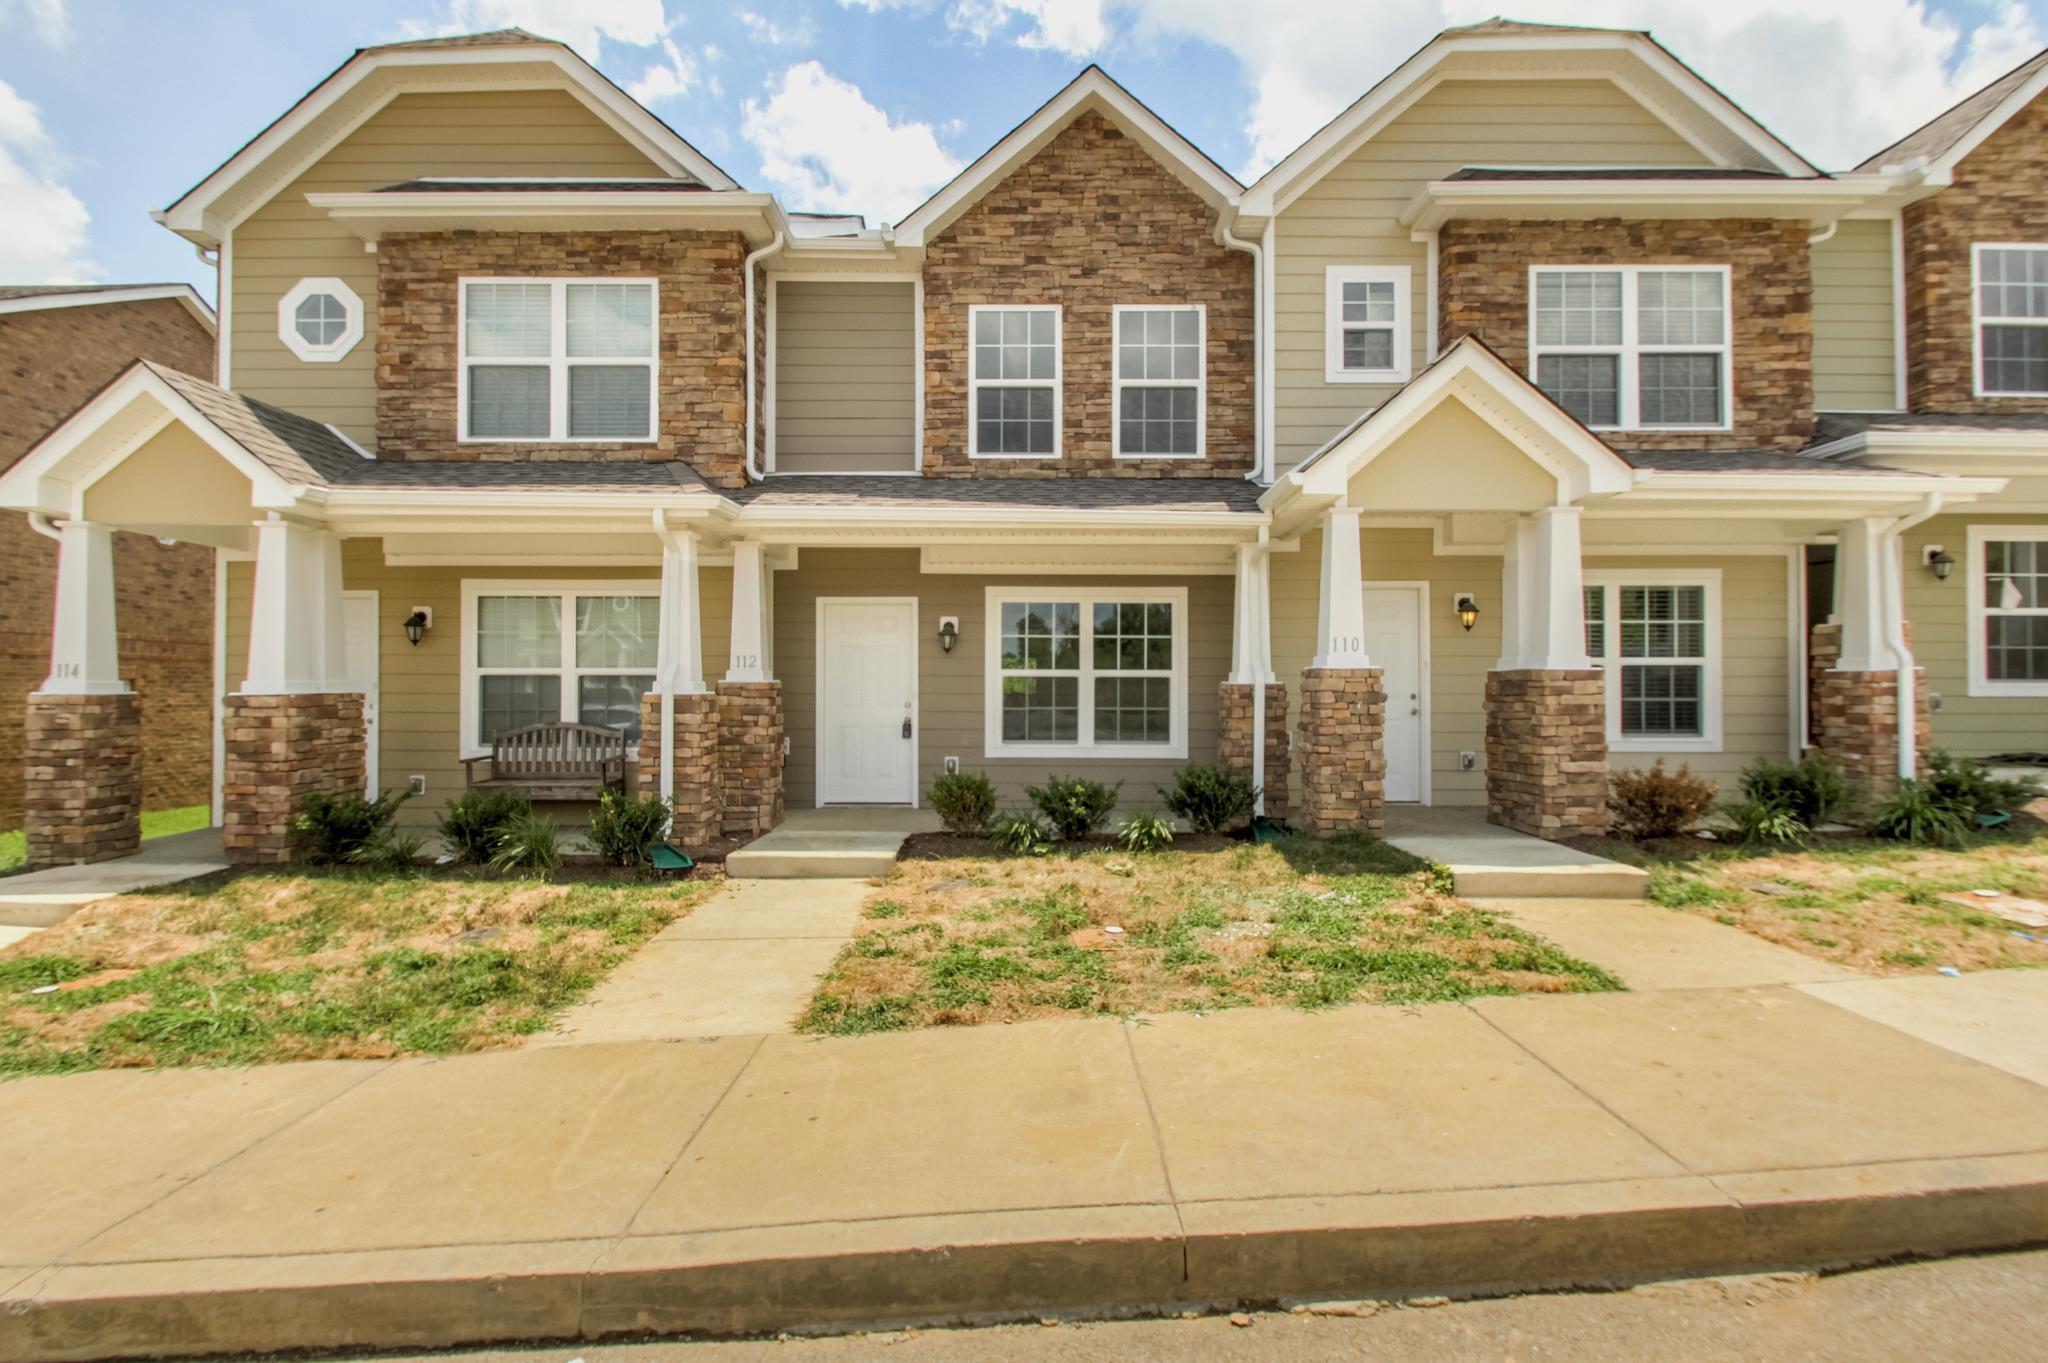 Photo of 292 Cobblestone Place Dr  Goodlettsville  TN